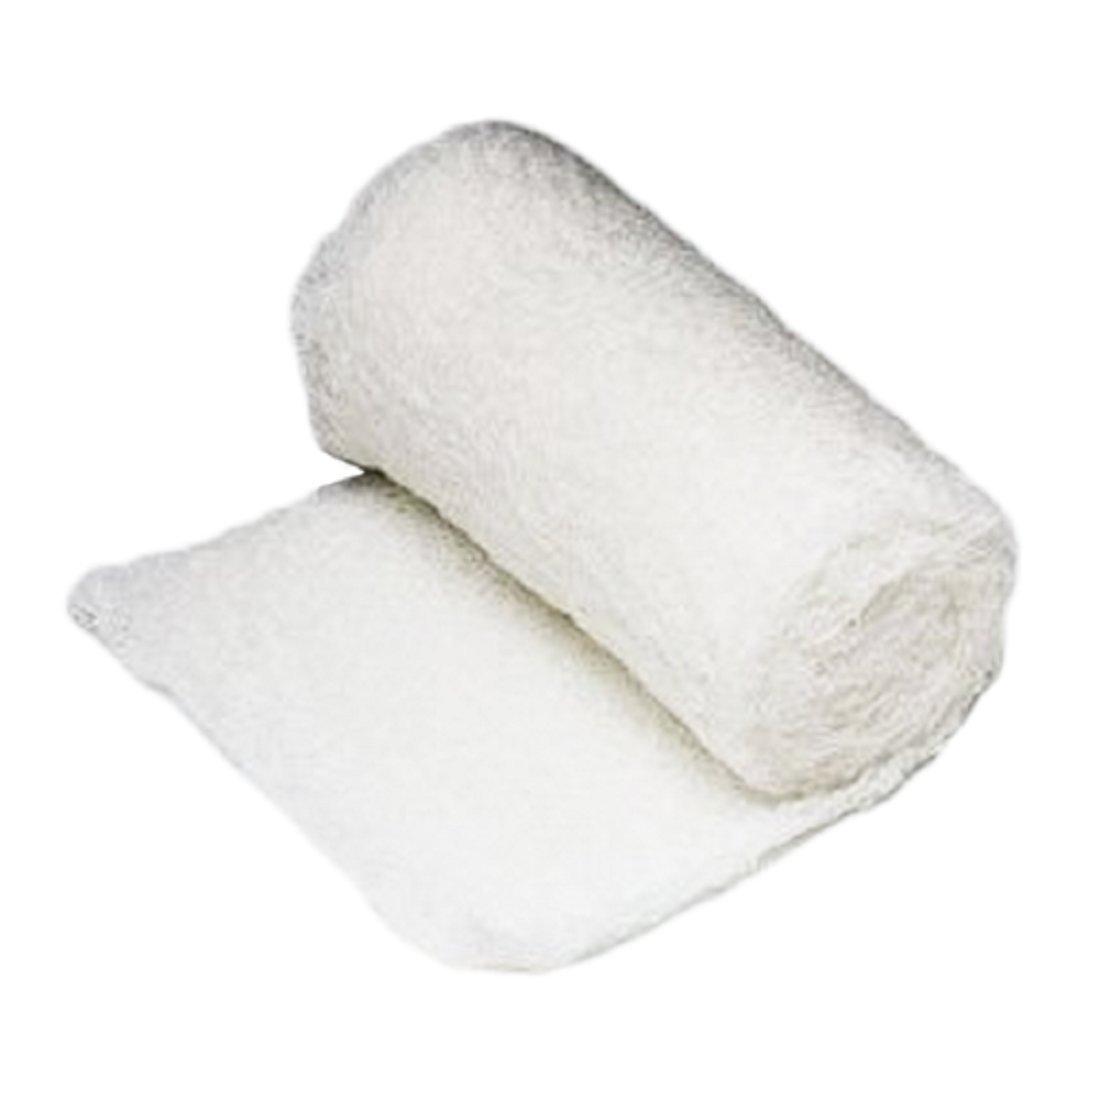 Kerlix Gauze Bandage Rolls 2 1/4'' X 9'yds. Sterile - Model 6720 (pack of 12)